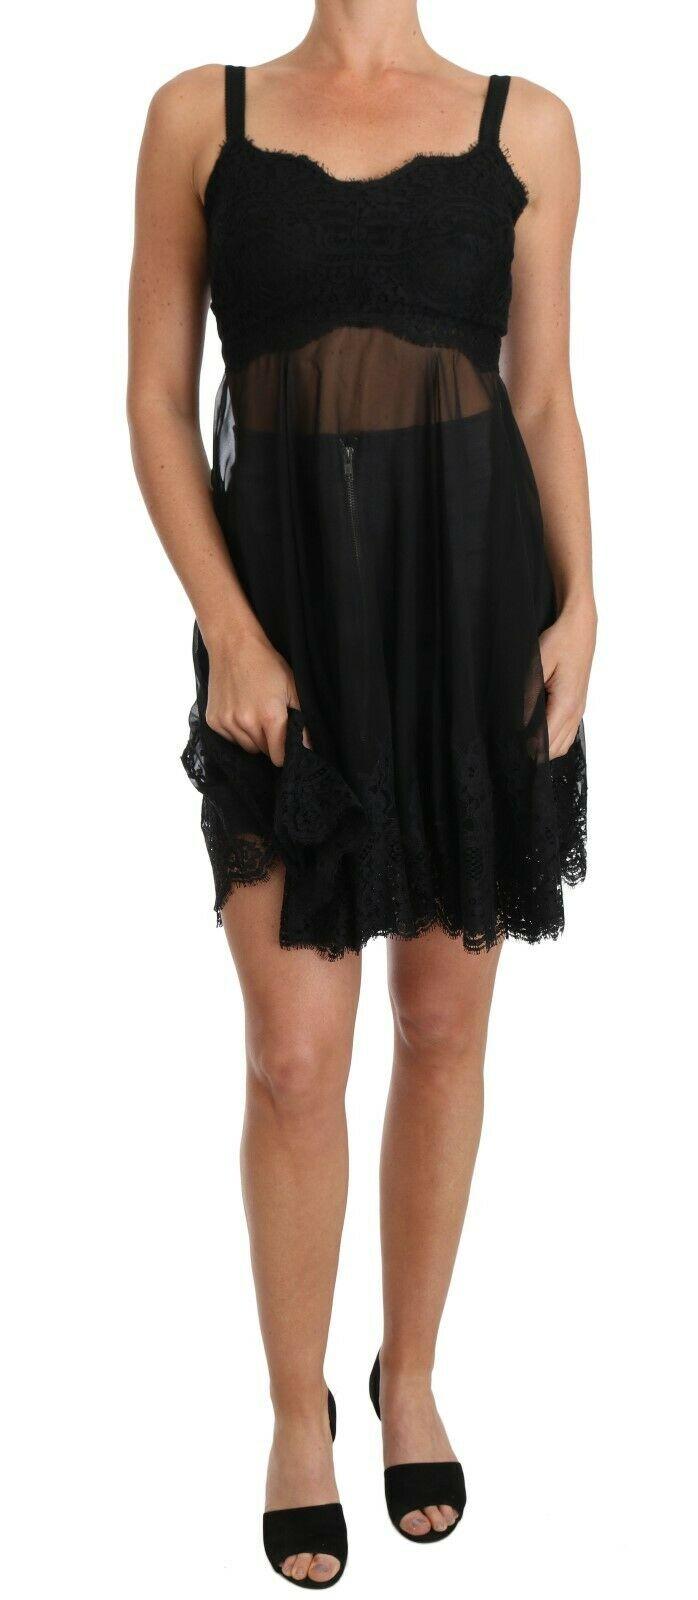 Dolce & Gabbana Women's Silk Lace Chemise Dress Black BIK099 - IT2 | S